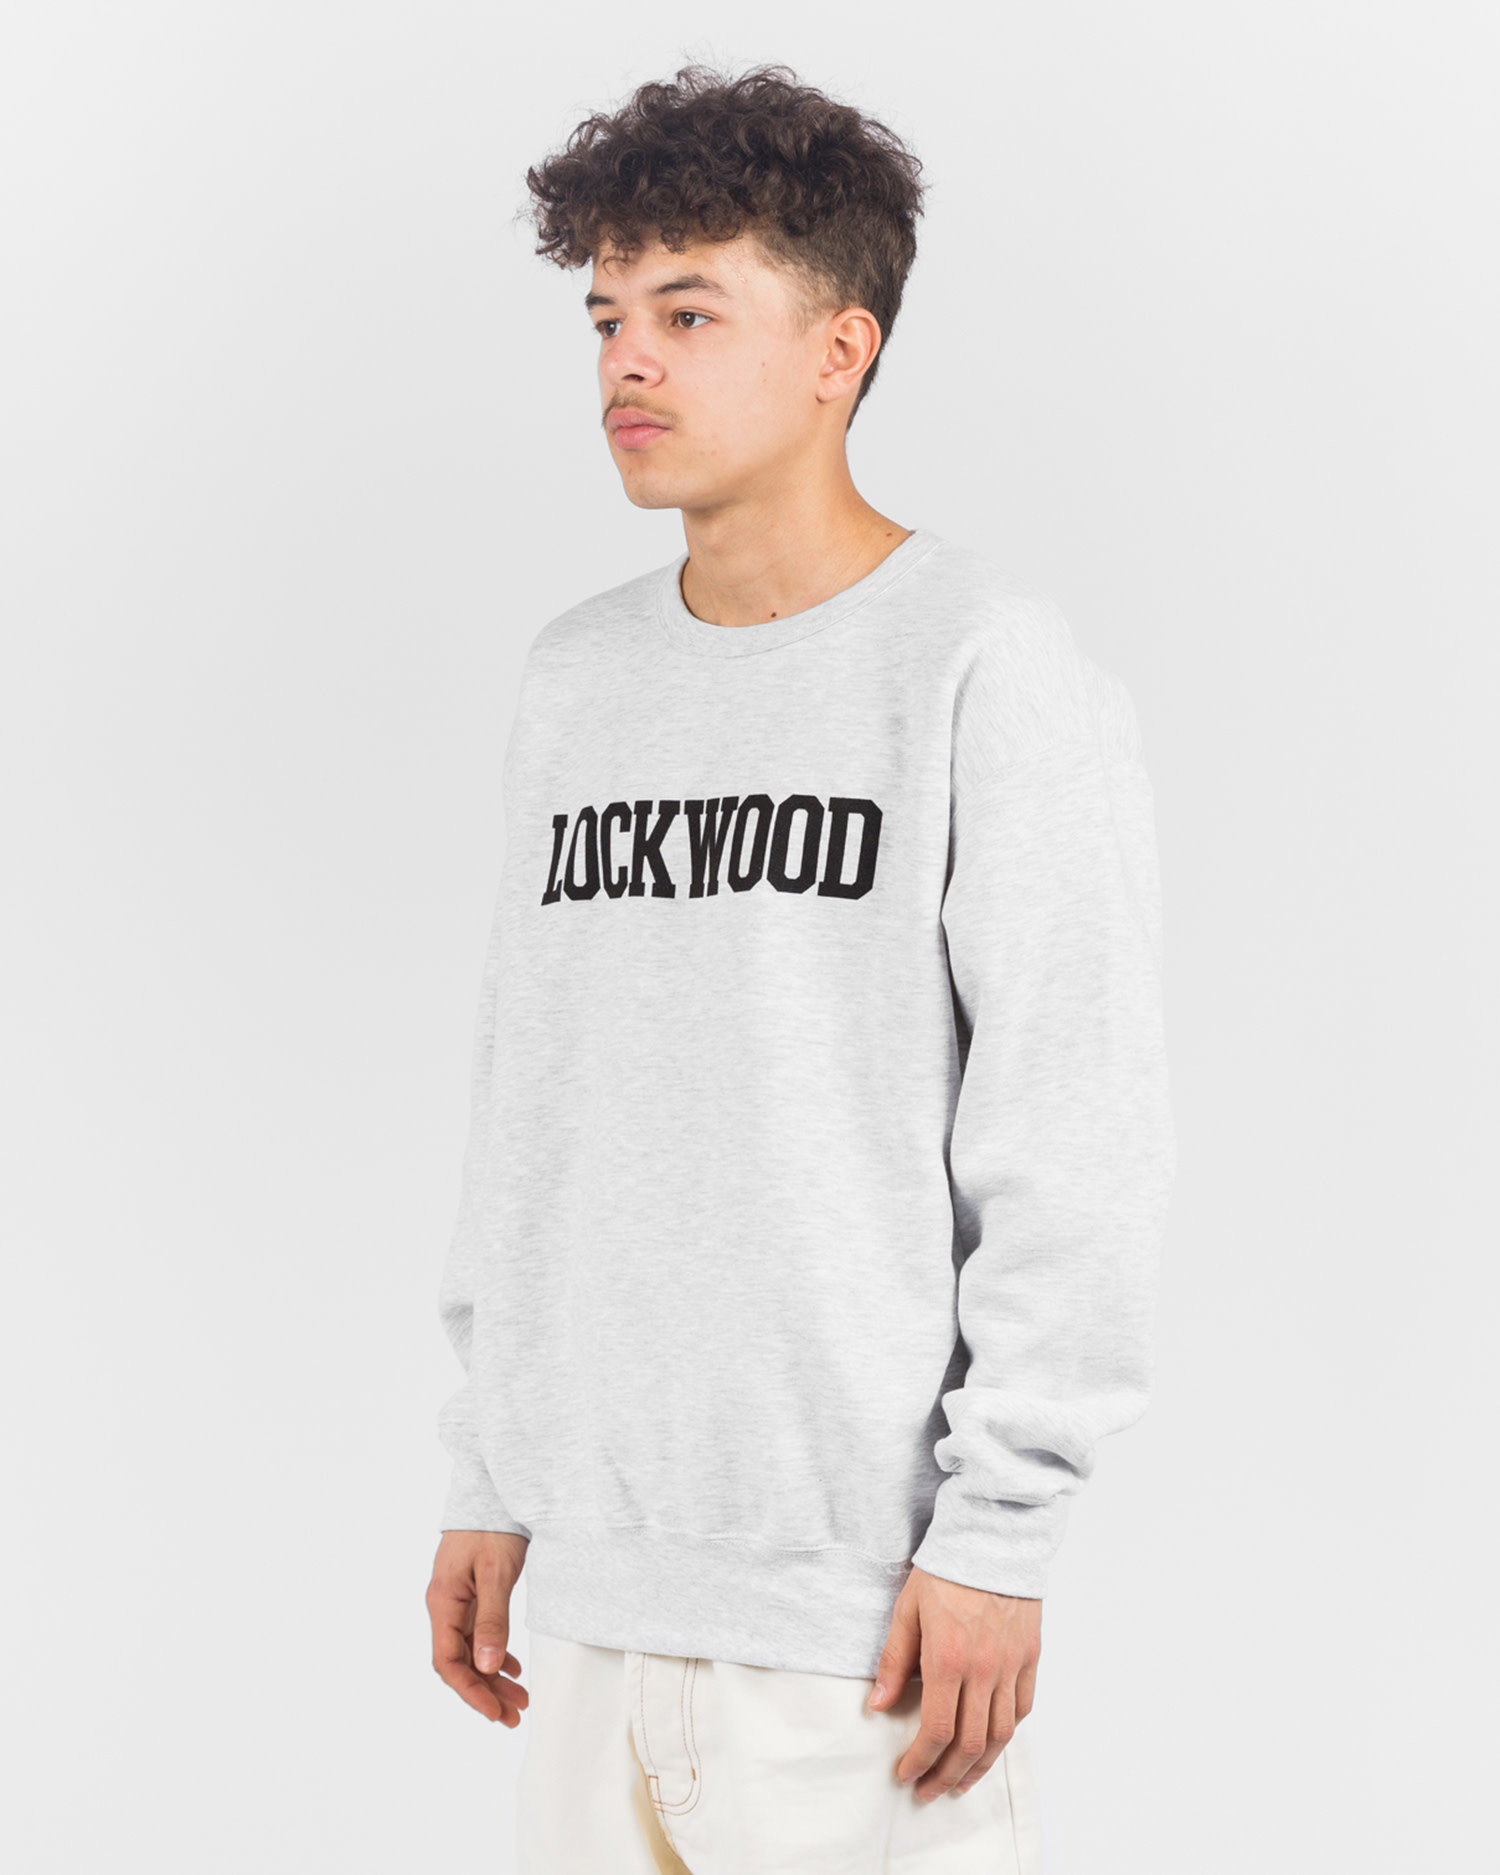 Lockwood OG Varsity Crewneck Grey/Black